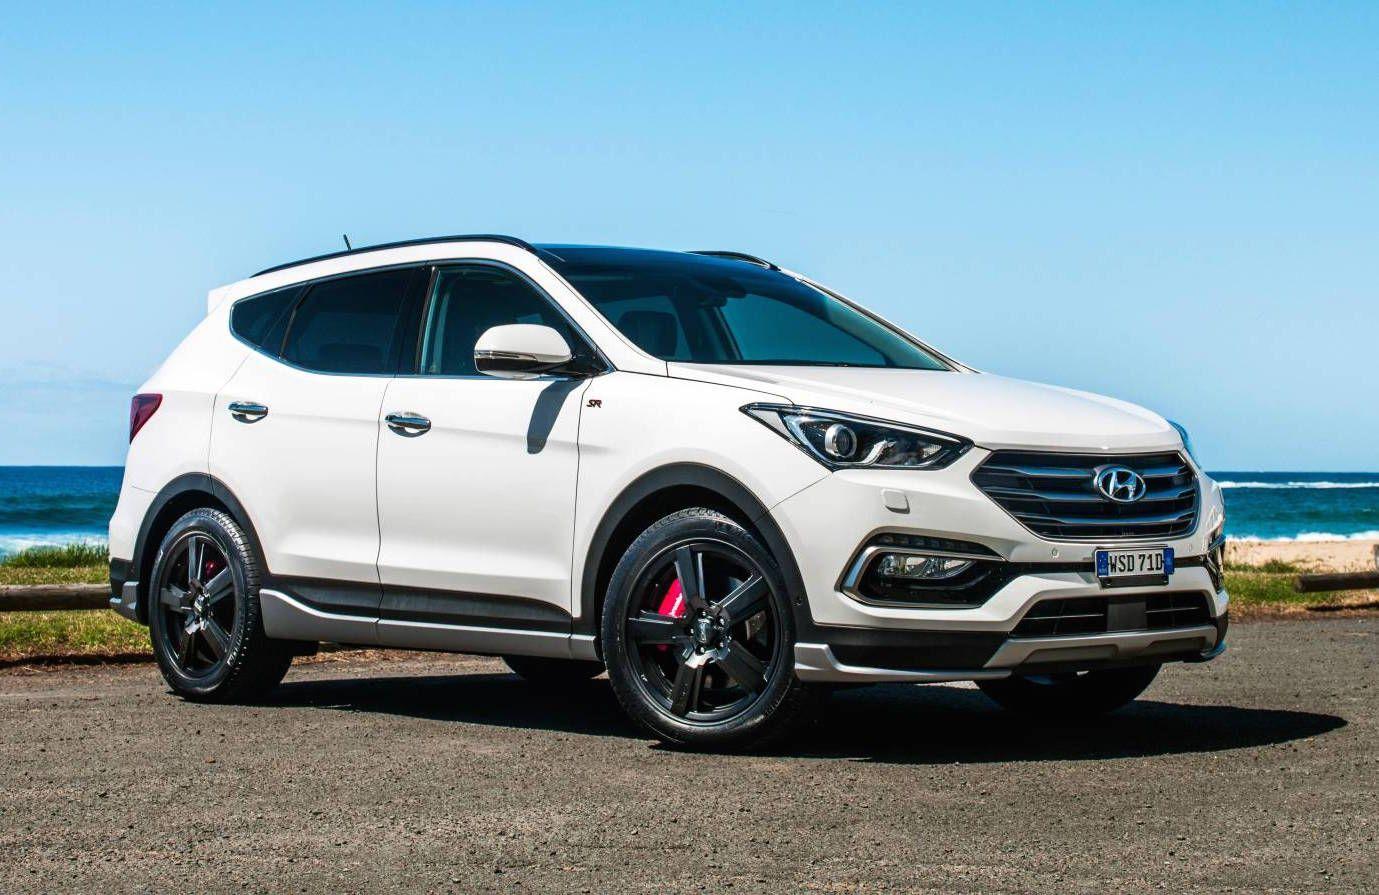 Buying And Selling Canadian Cars 2016 Hyundai Santa Fe In